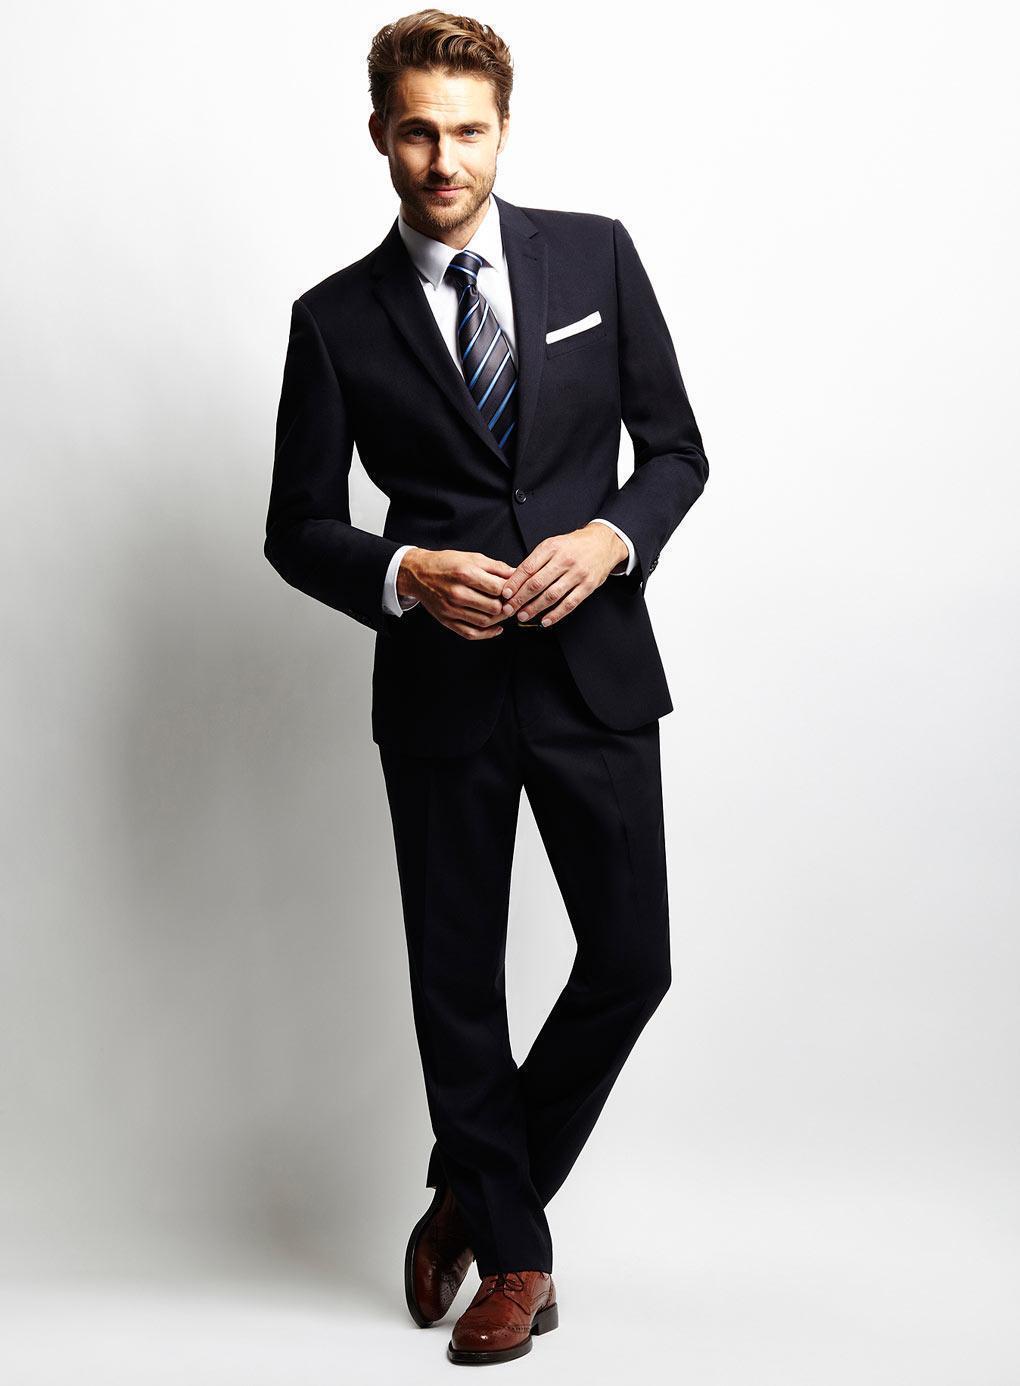 Custom Made Black Wool Blended Wedding Suits Groom Tuxedos Wedding Suits Business SuitsJacket+Pants